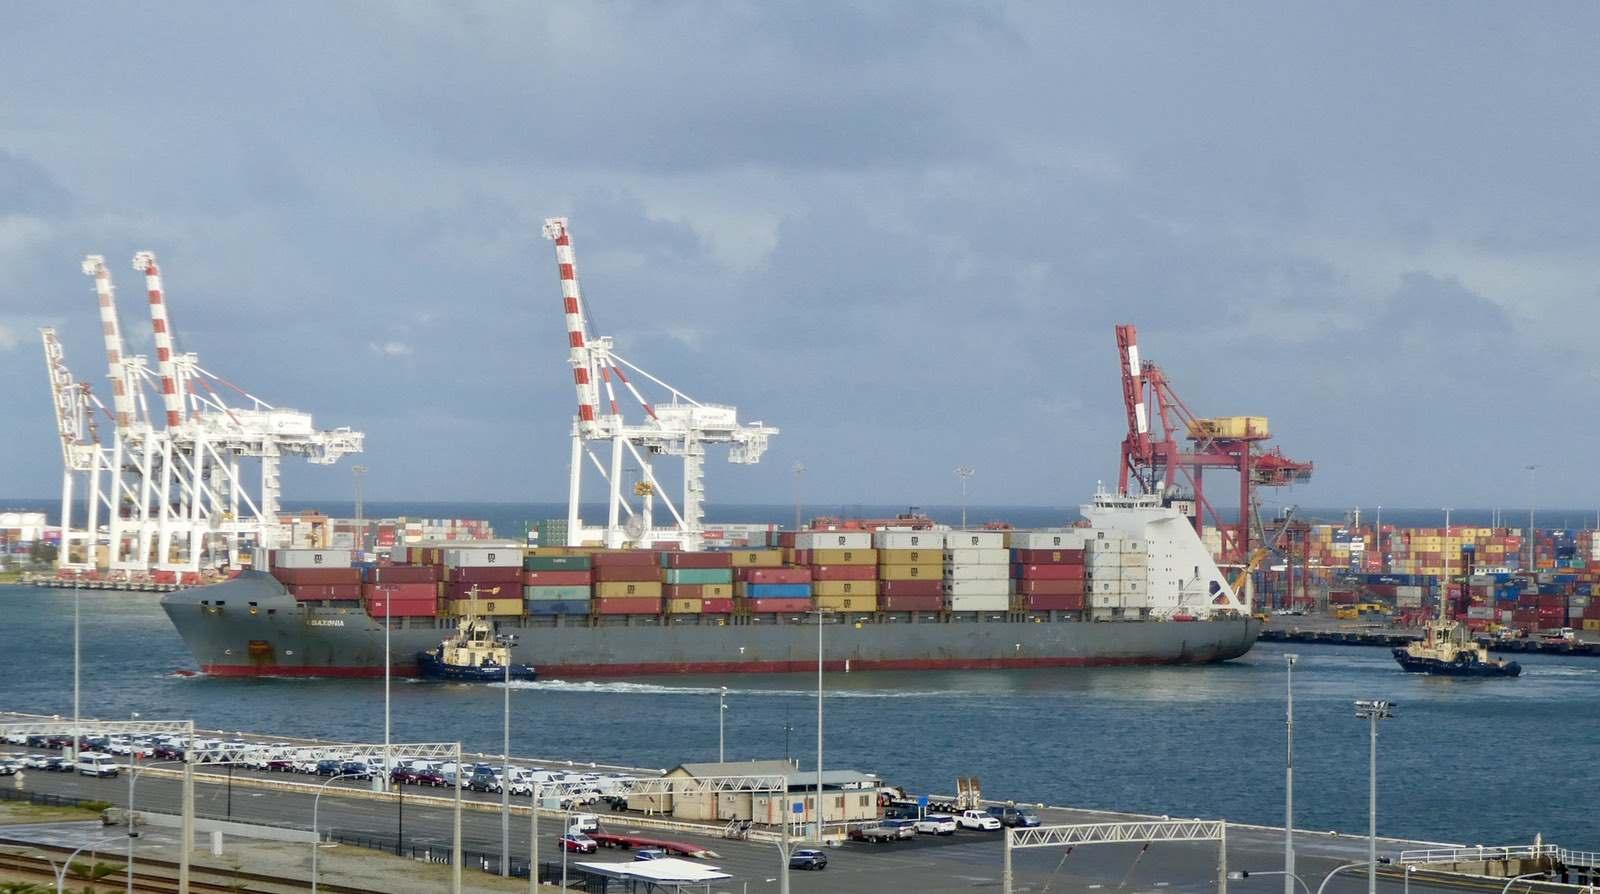 Fremantle Port today